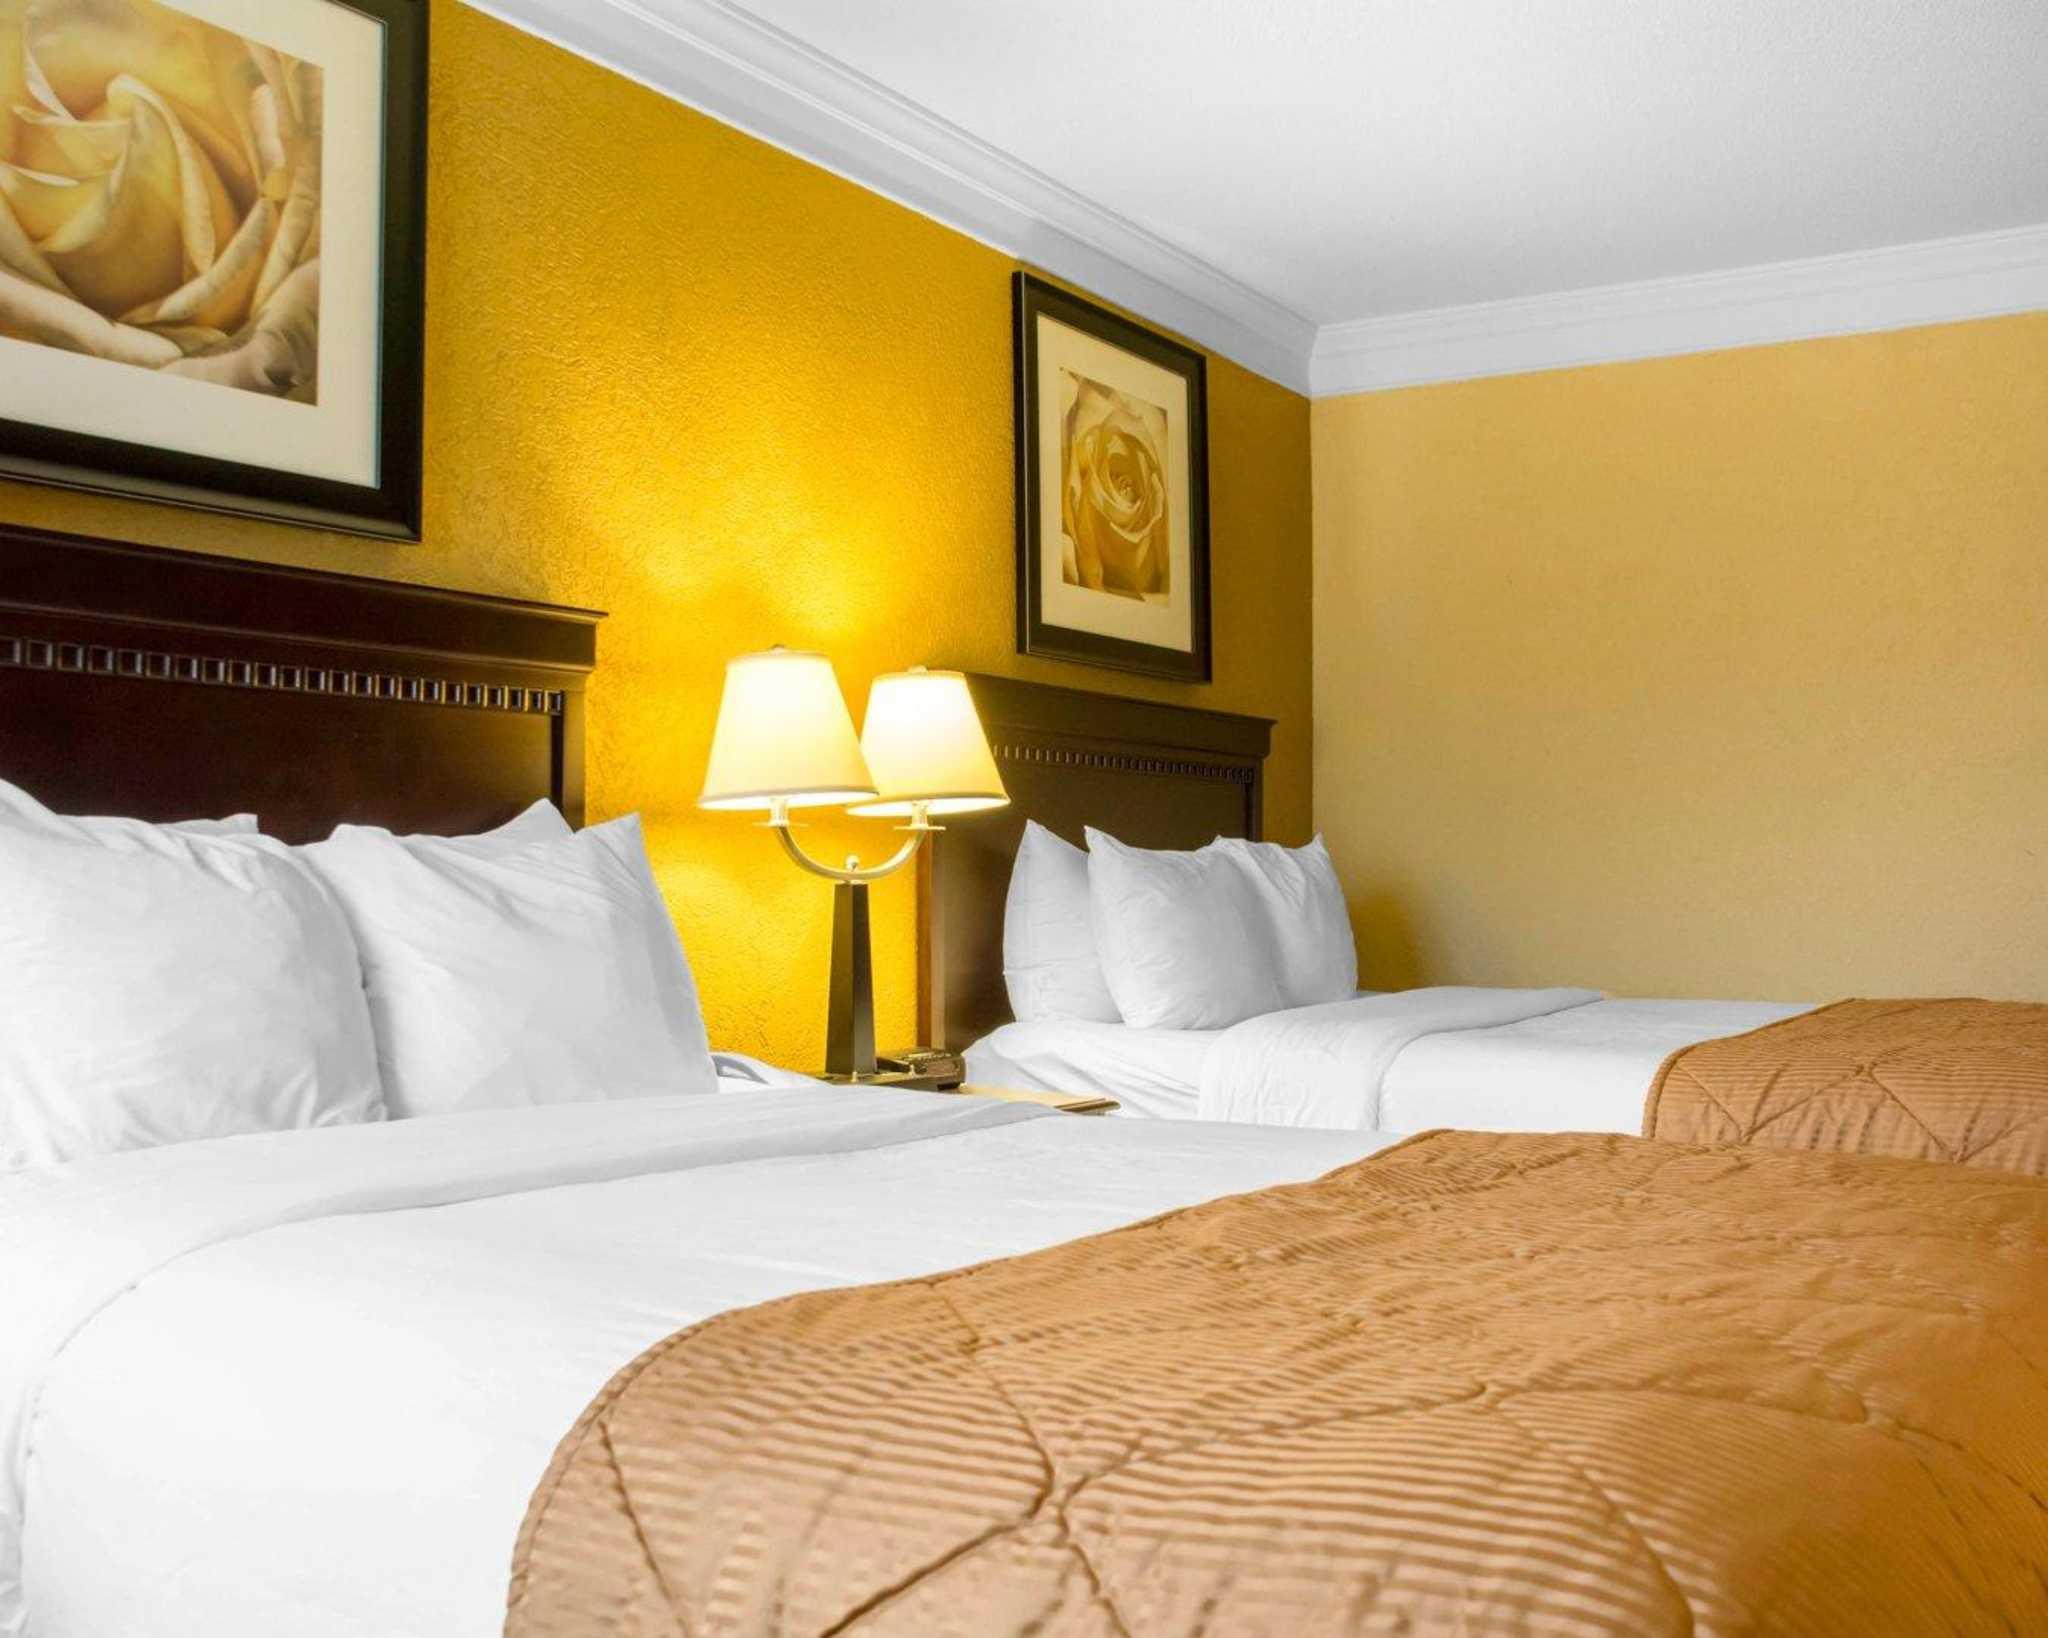 Quality Inn & Suites Fairgrounds image 8